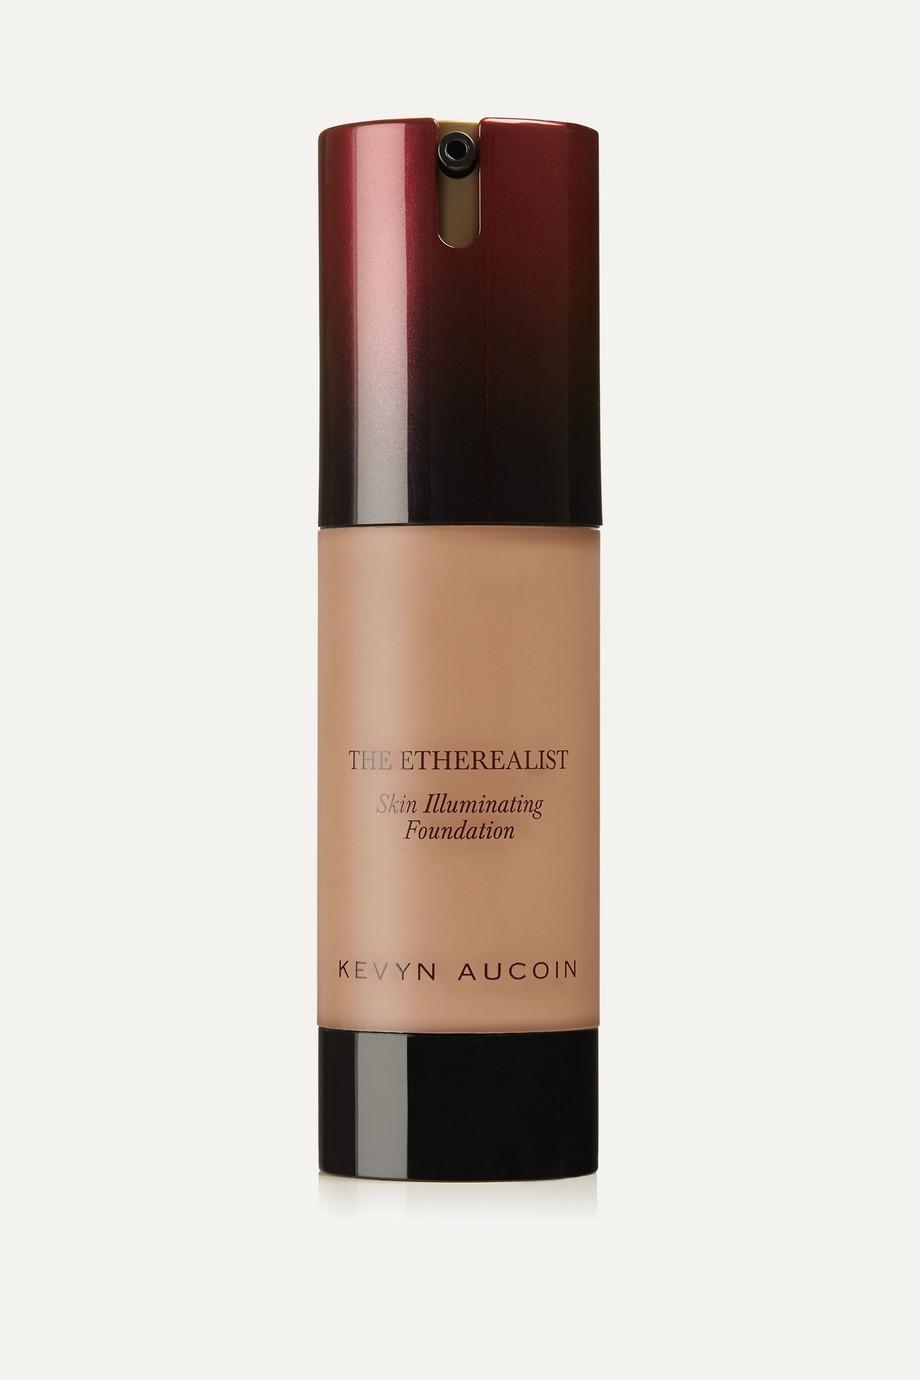 Kevyn Aucoin The Etherealist Skin Illuminating Foundation - Medium EF 09, 28ml